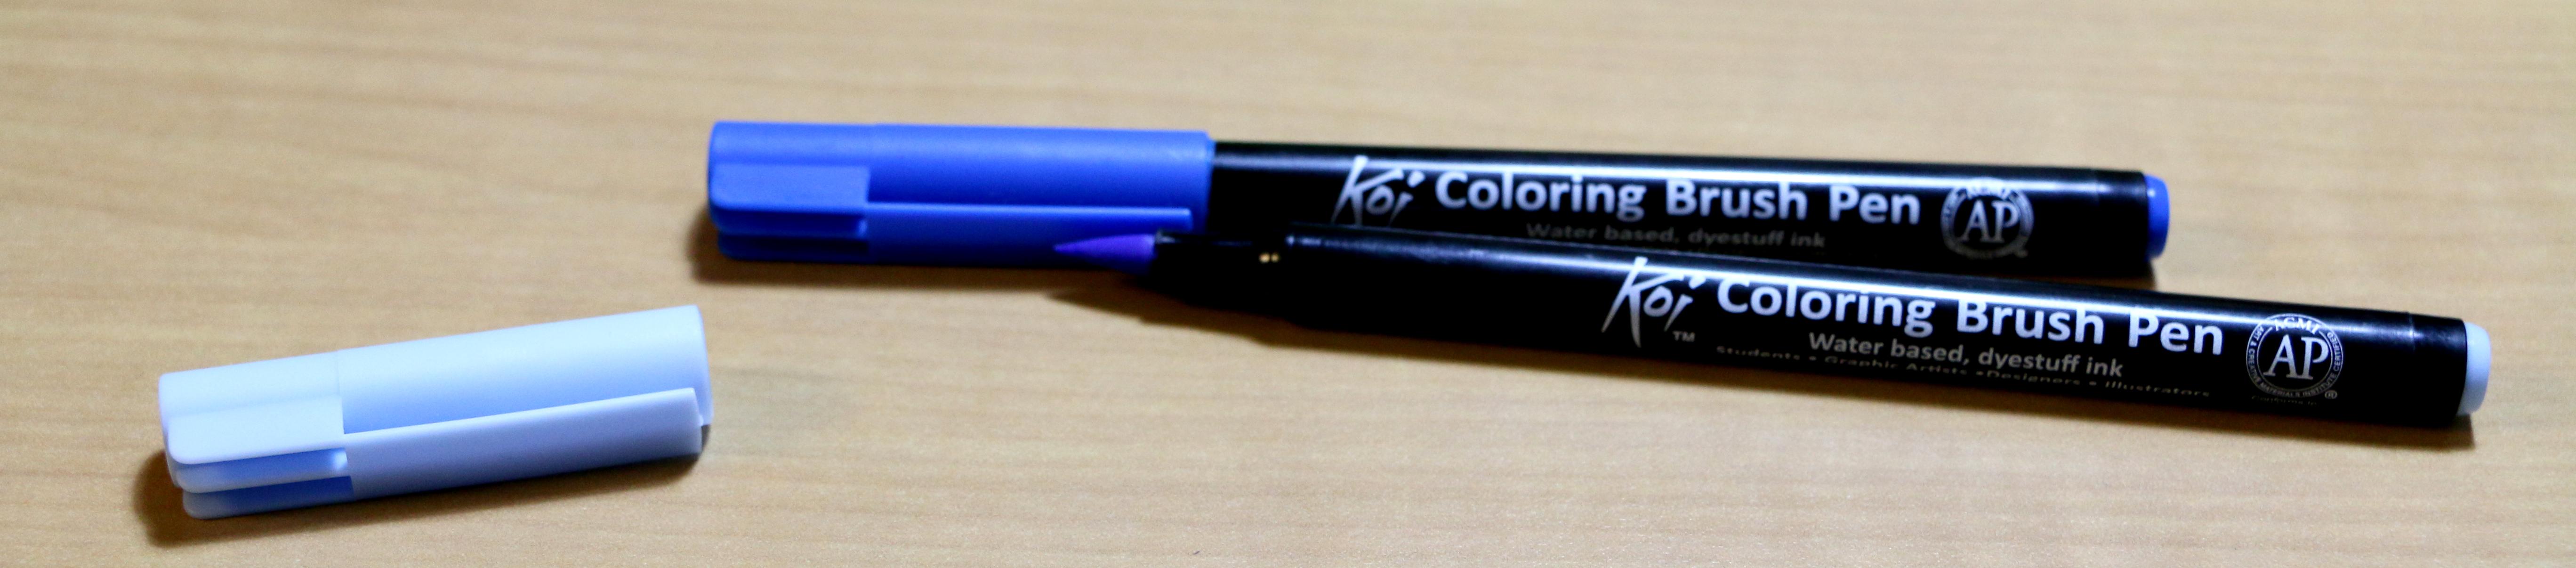 koi-brush-pen-sakura-02